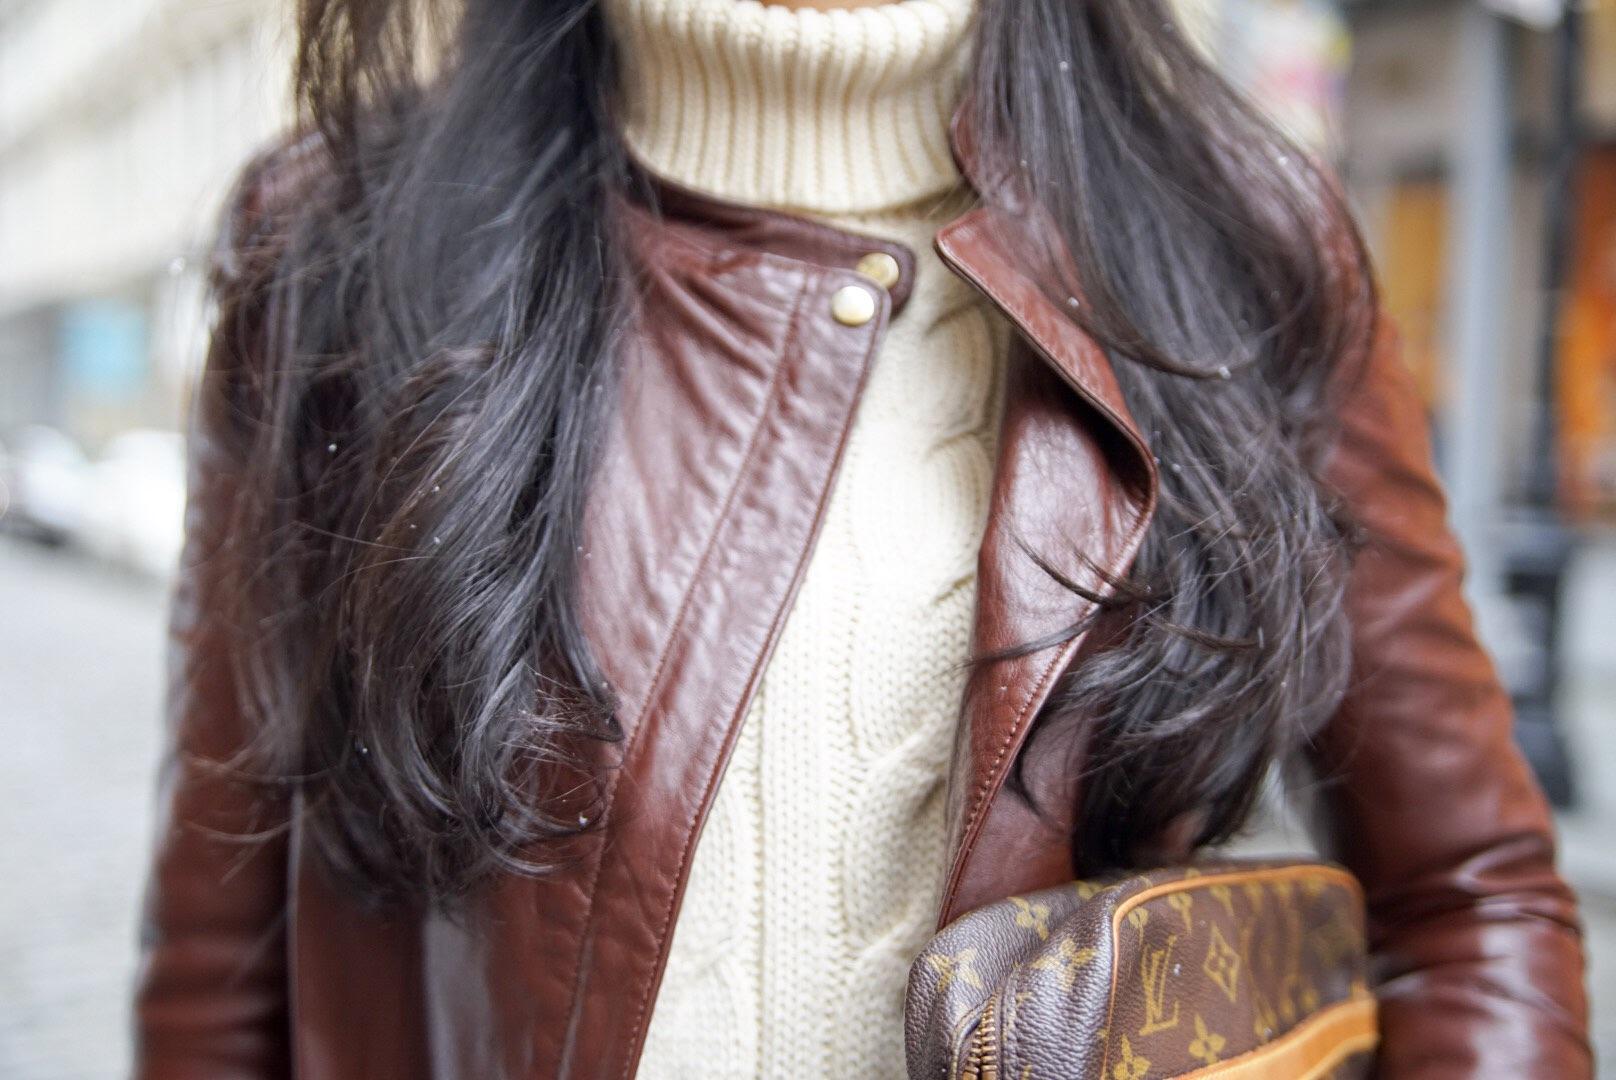 Soho New York Zara Leather Jacket Ralph Lauren Turtleneck Zara Moto Jeans Chanel Ballet Flats Louis Vuitton Clutch